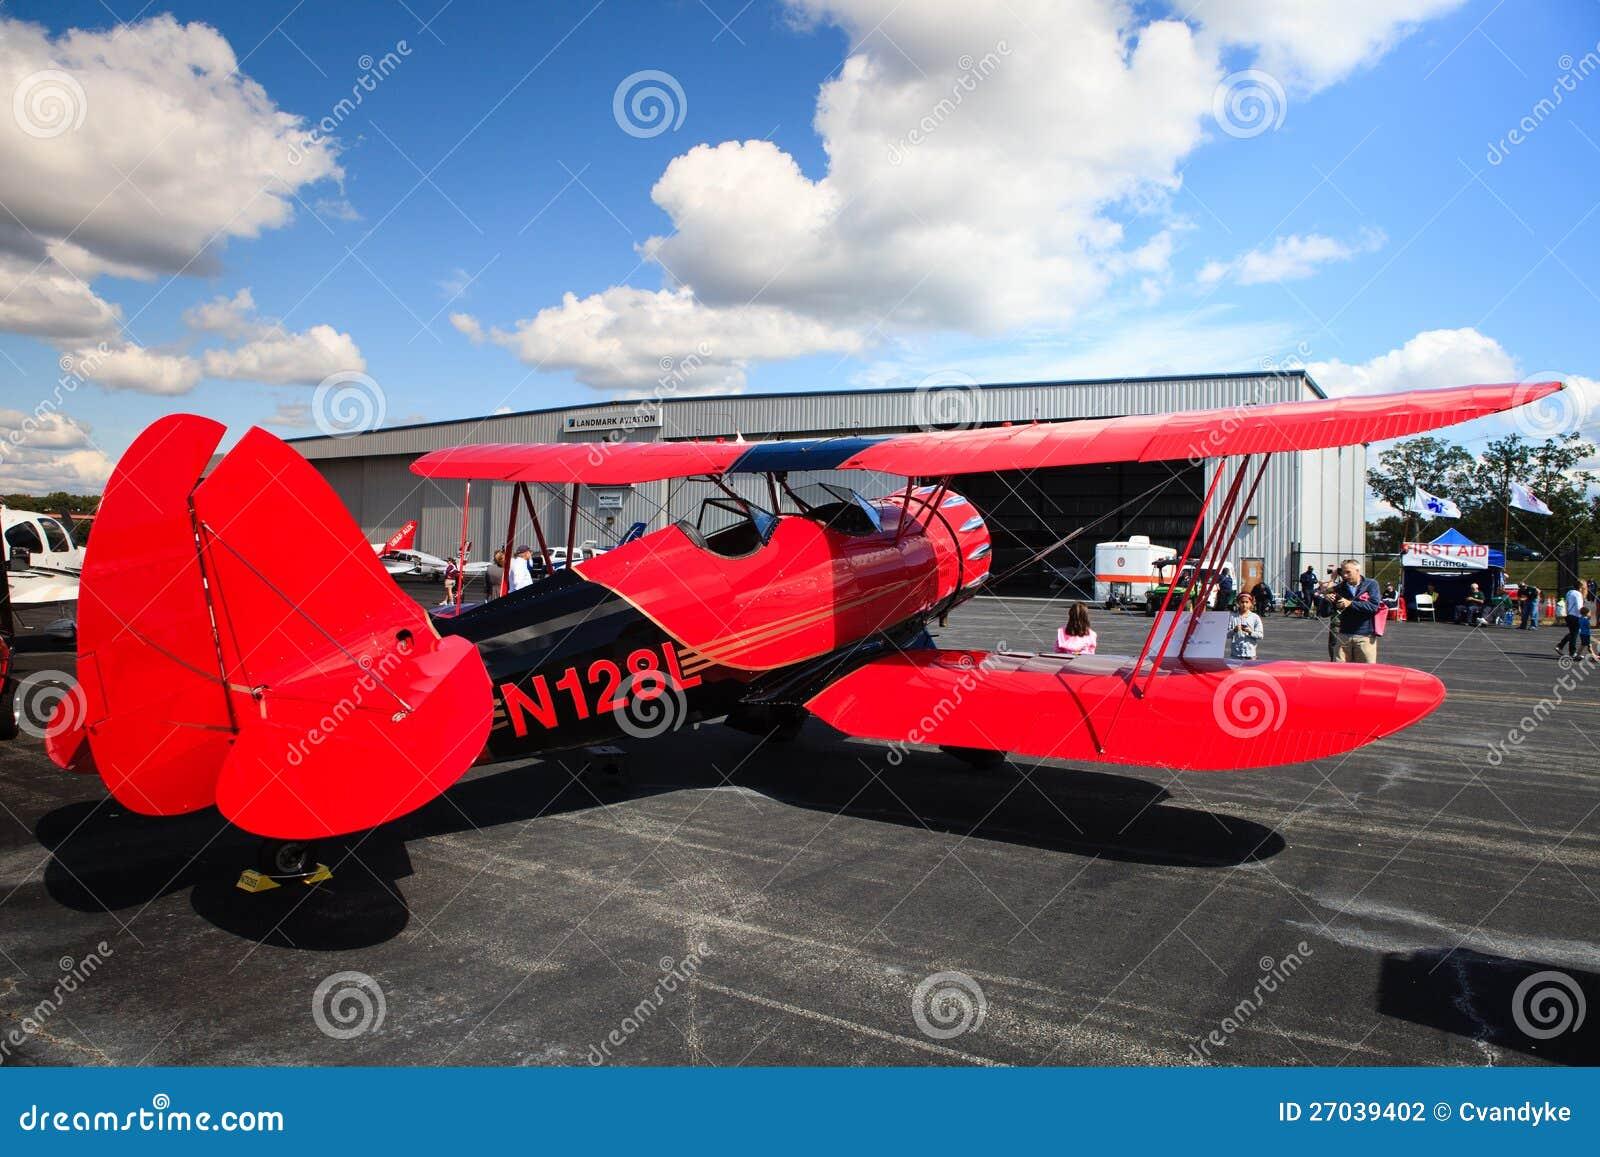 Avion sur le macadam